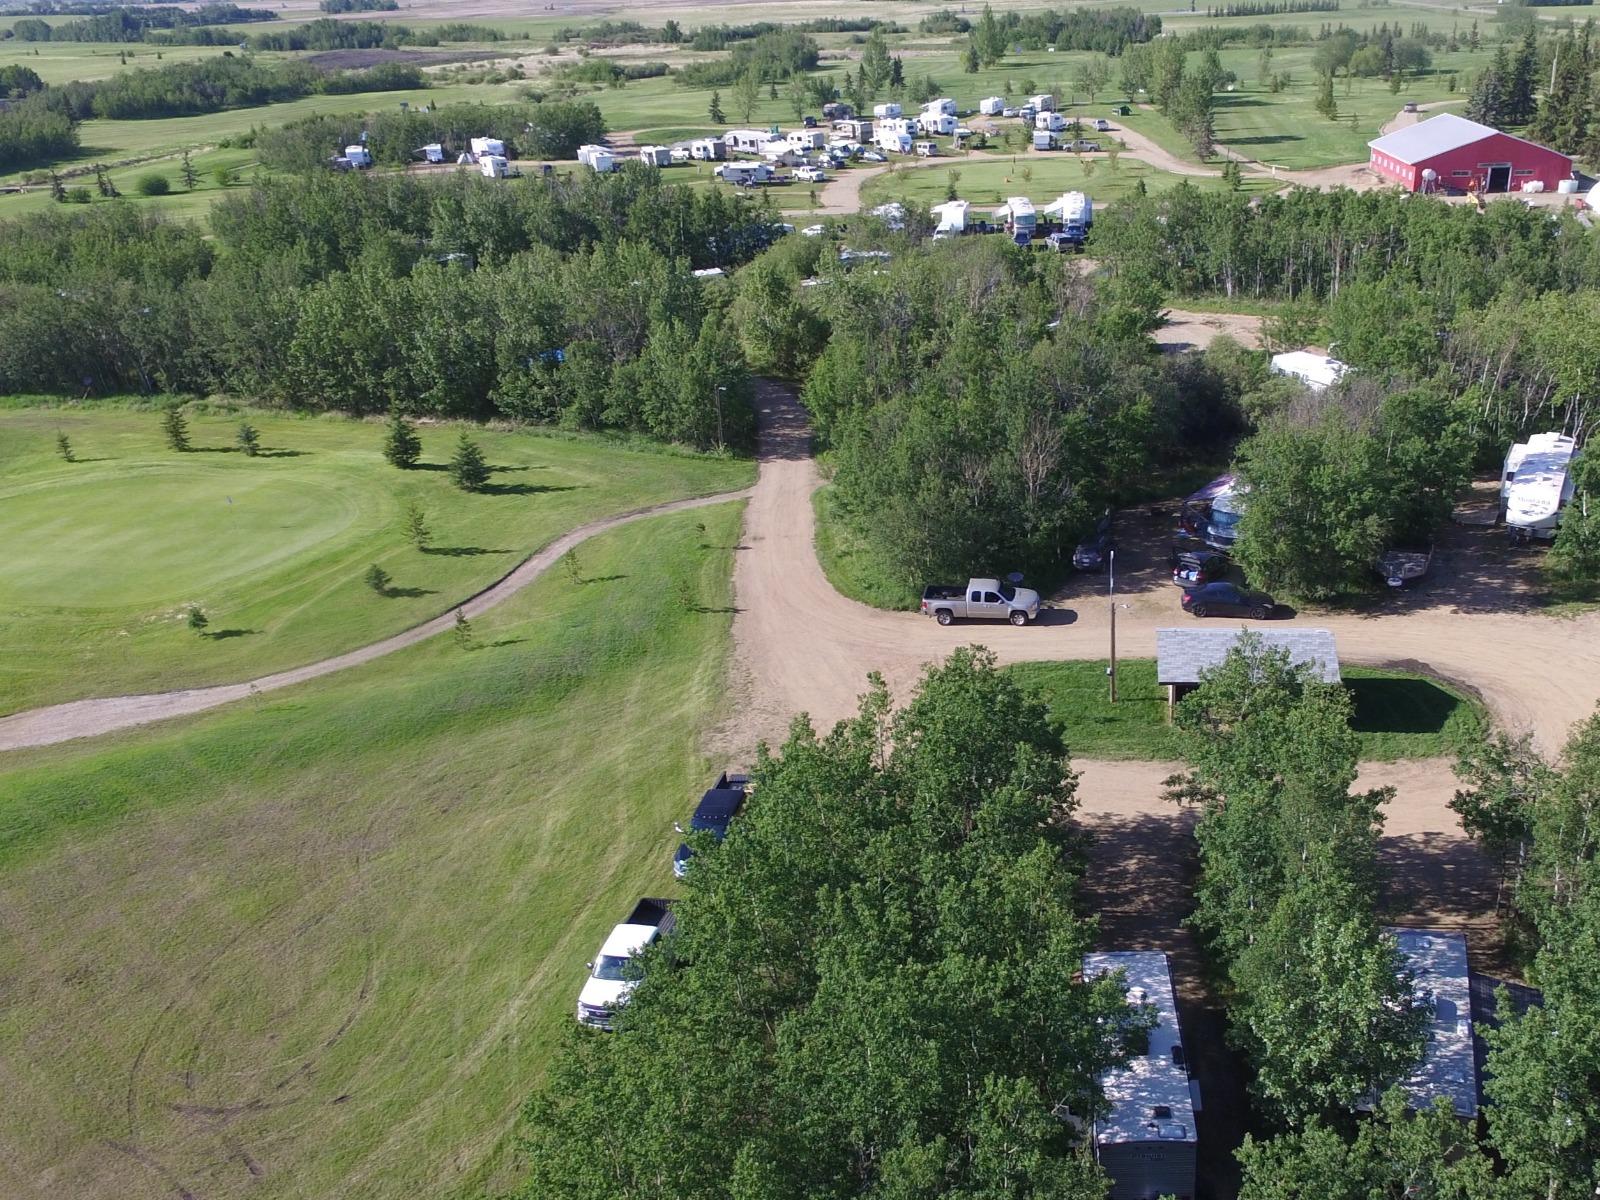 Whistlestop Golf & Campground